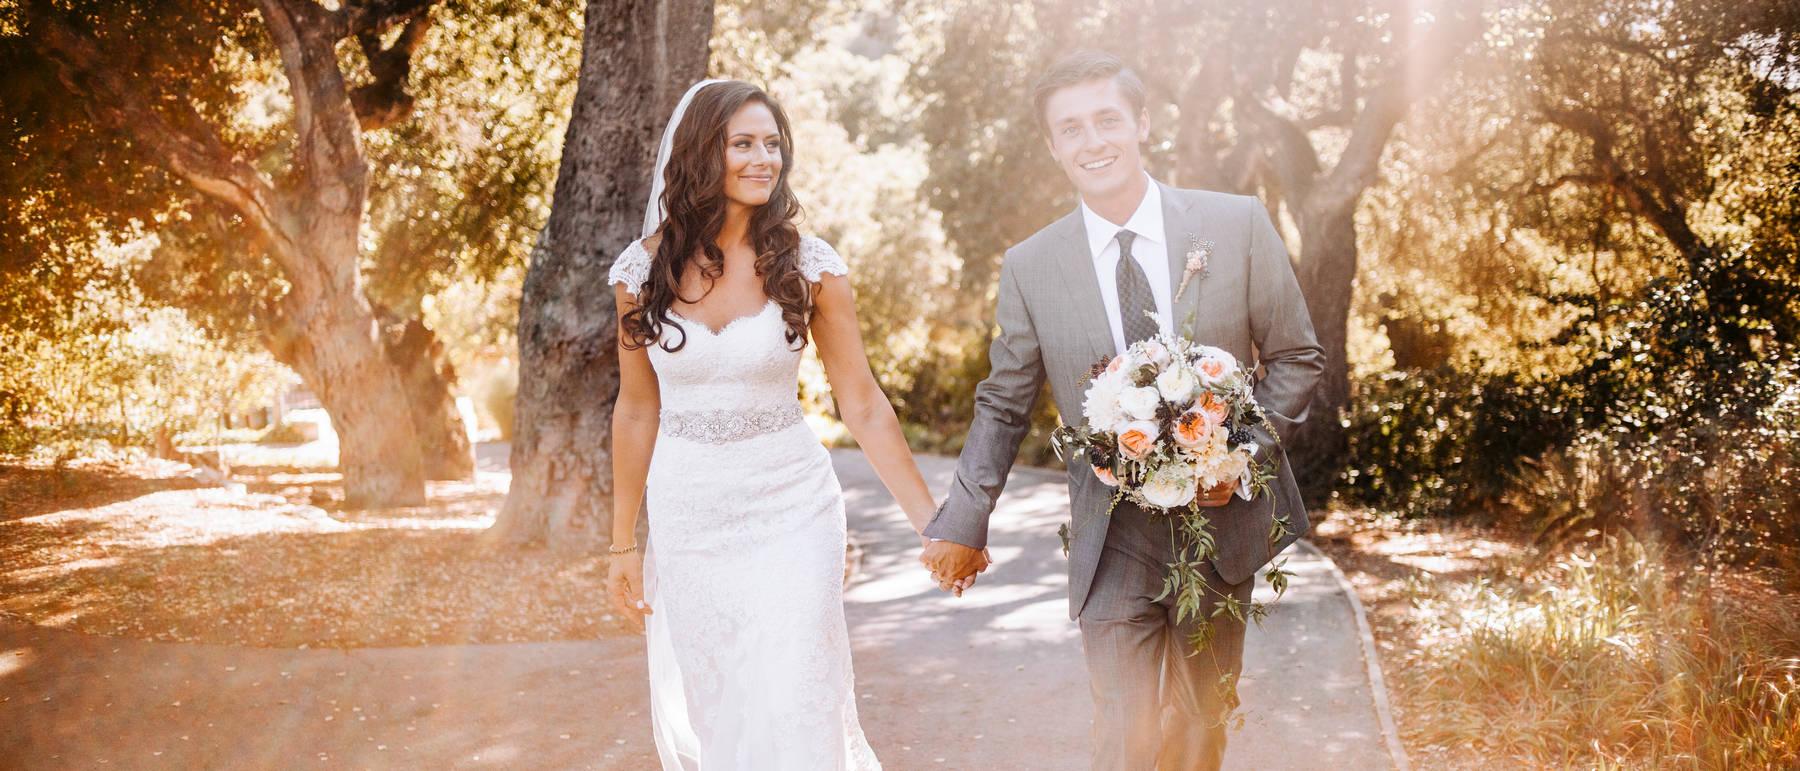 johnandjoseph-wedding-photographer-hz-slider-273